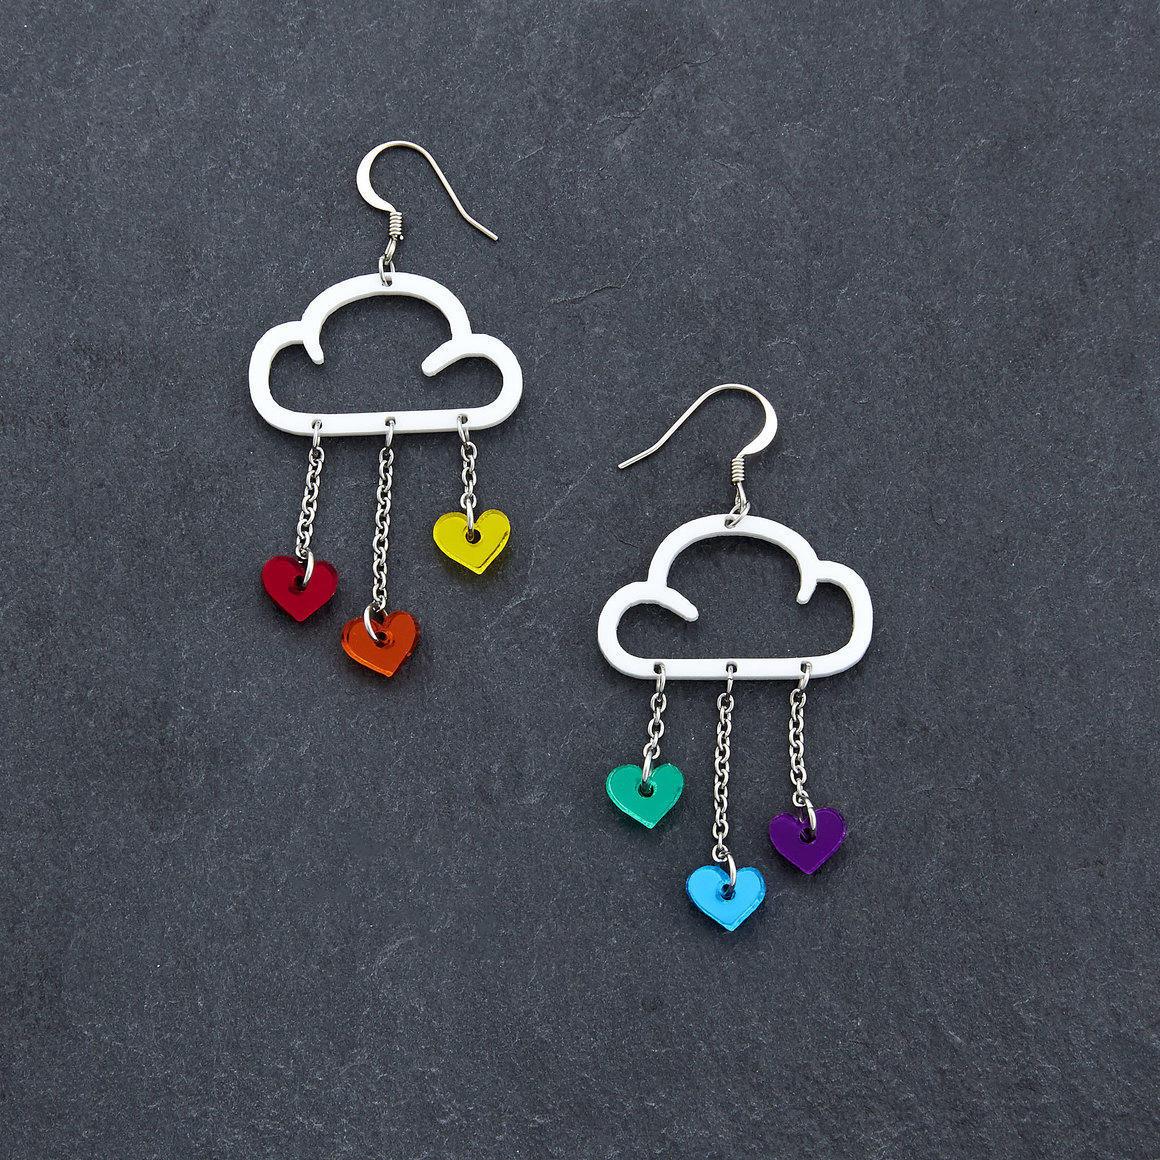 Dangle Earrings - LOVE RAIN - White Rainbow | Trada Marketplace